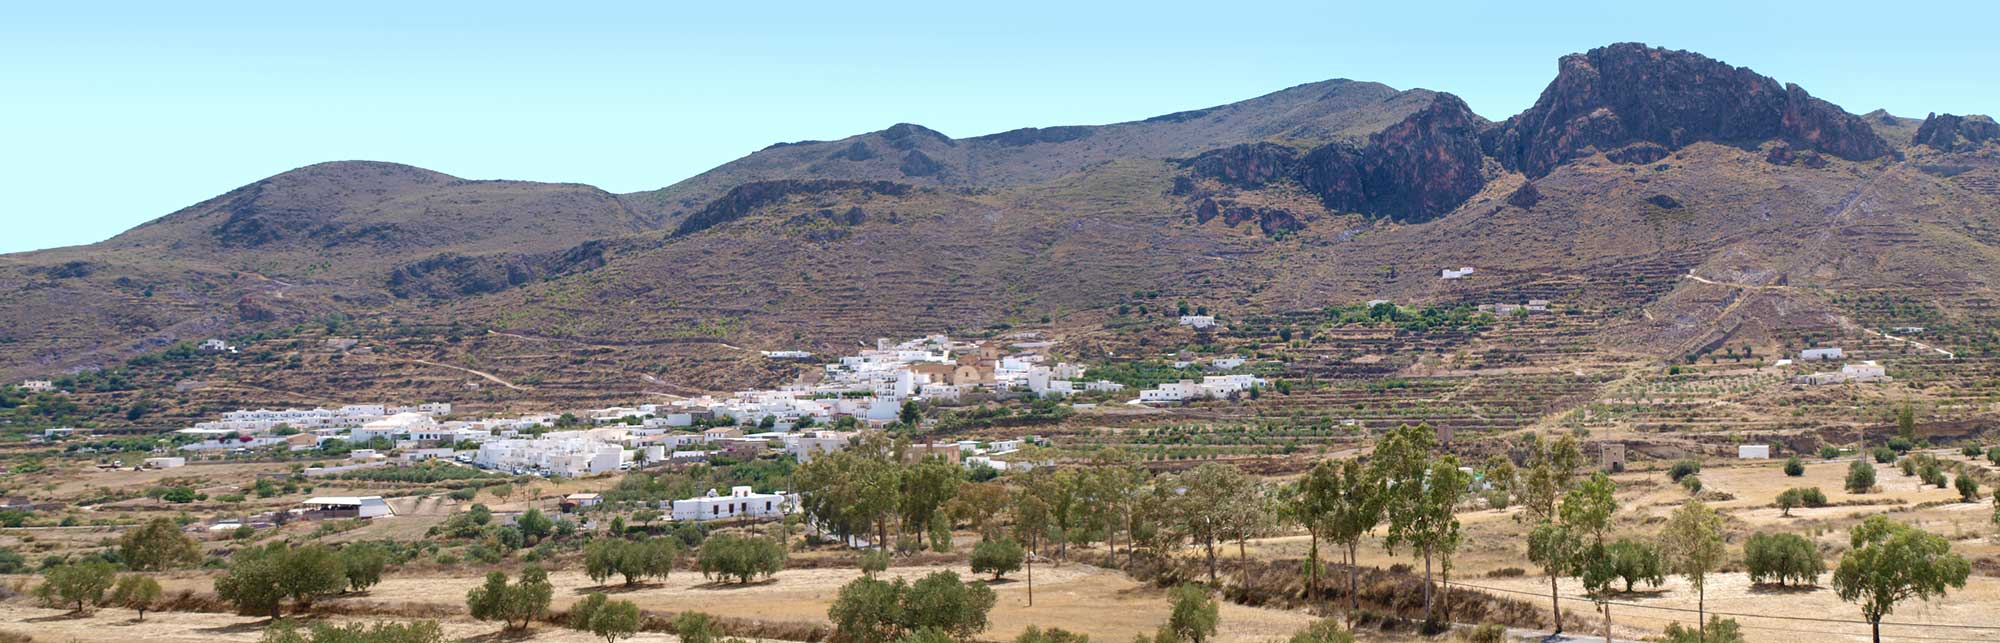 Vista general de Lucainena de las Torres